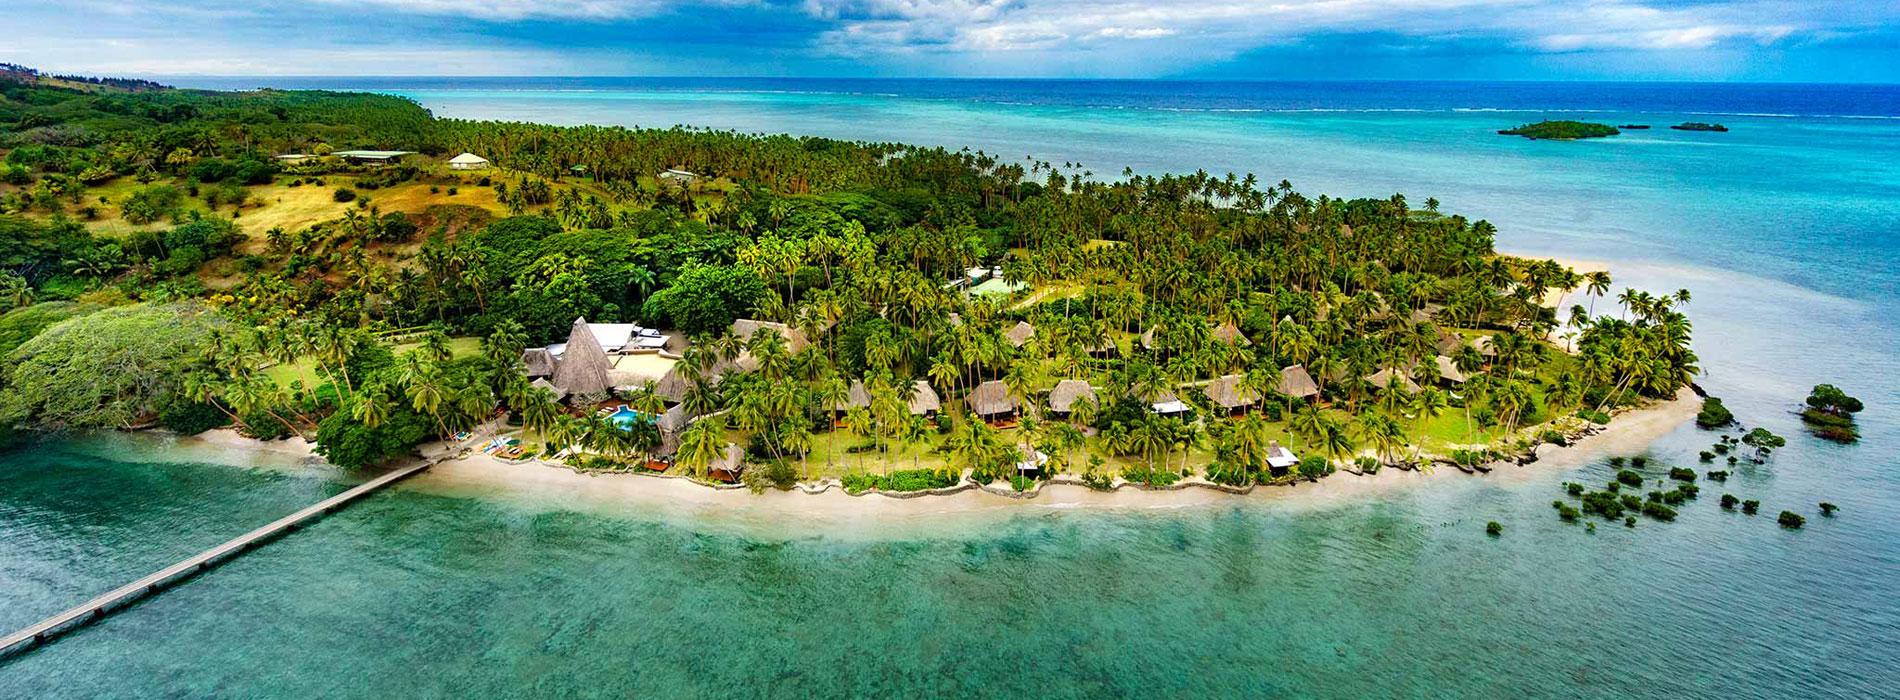 fiji resorts and hotels